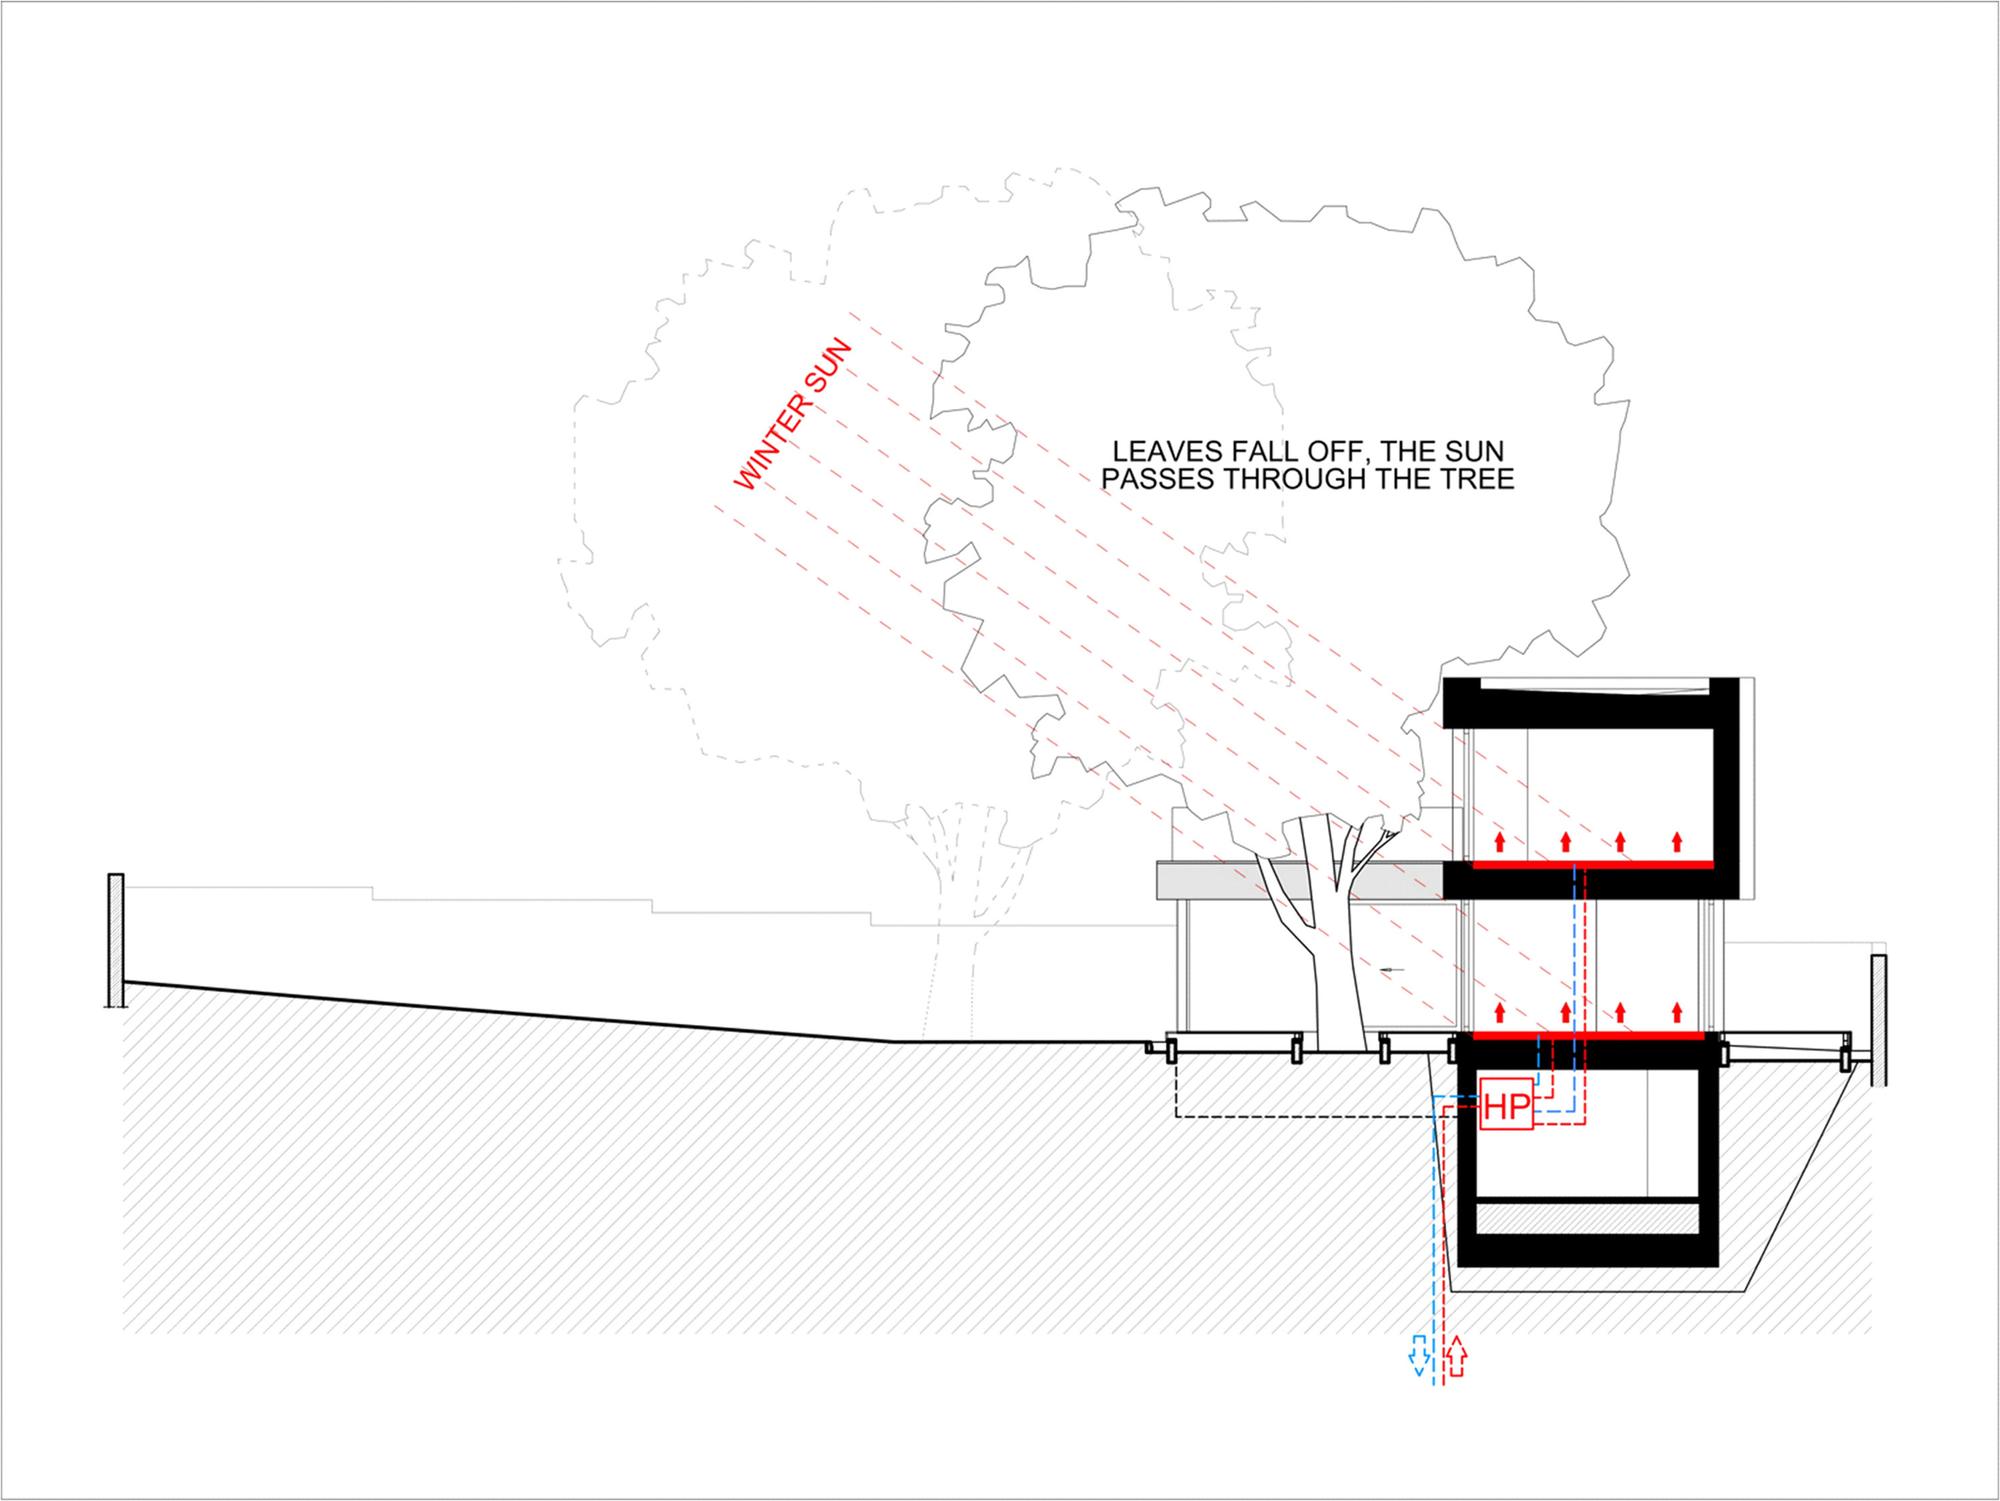 2-oaks-house-obia_obia_2oaks_drawing_section_winter